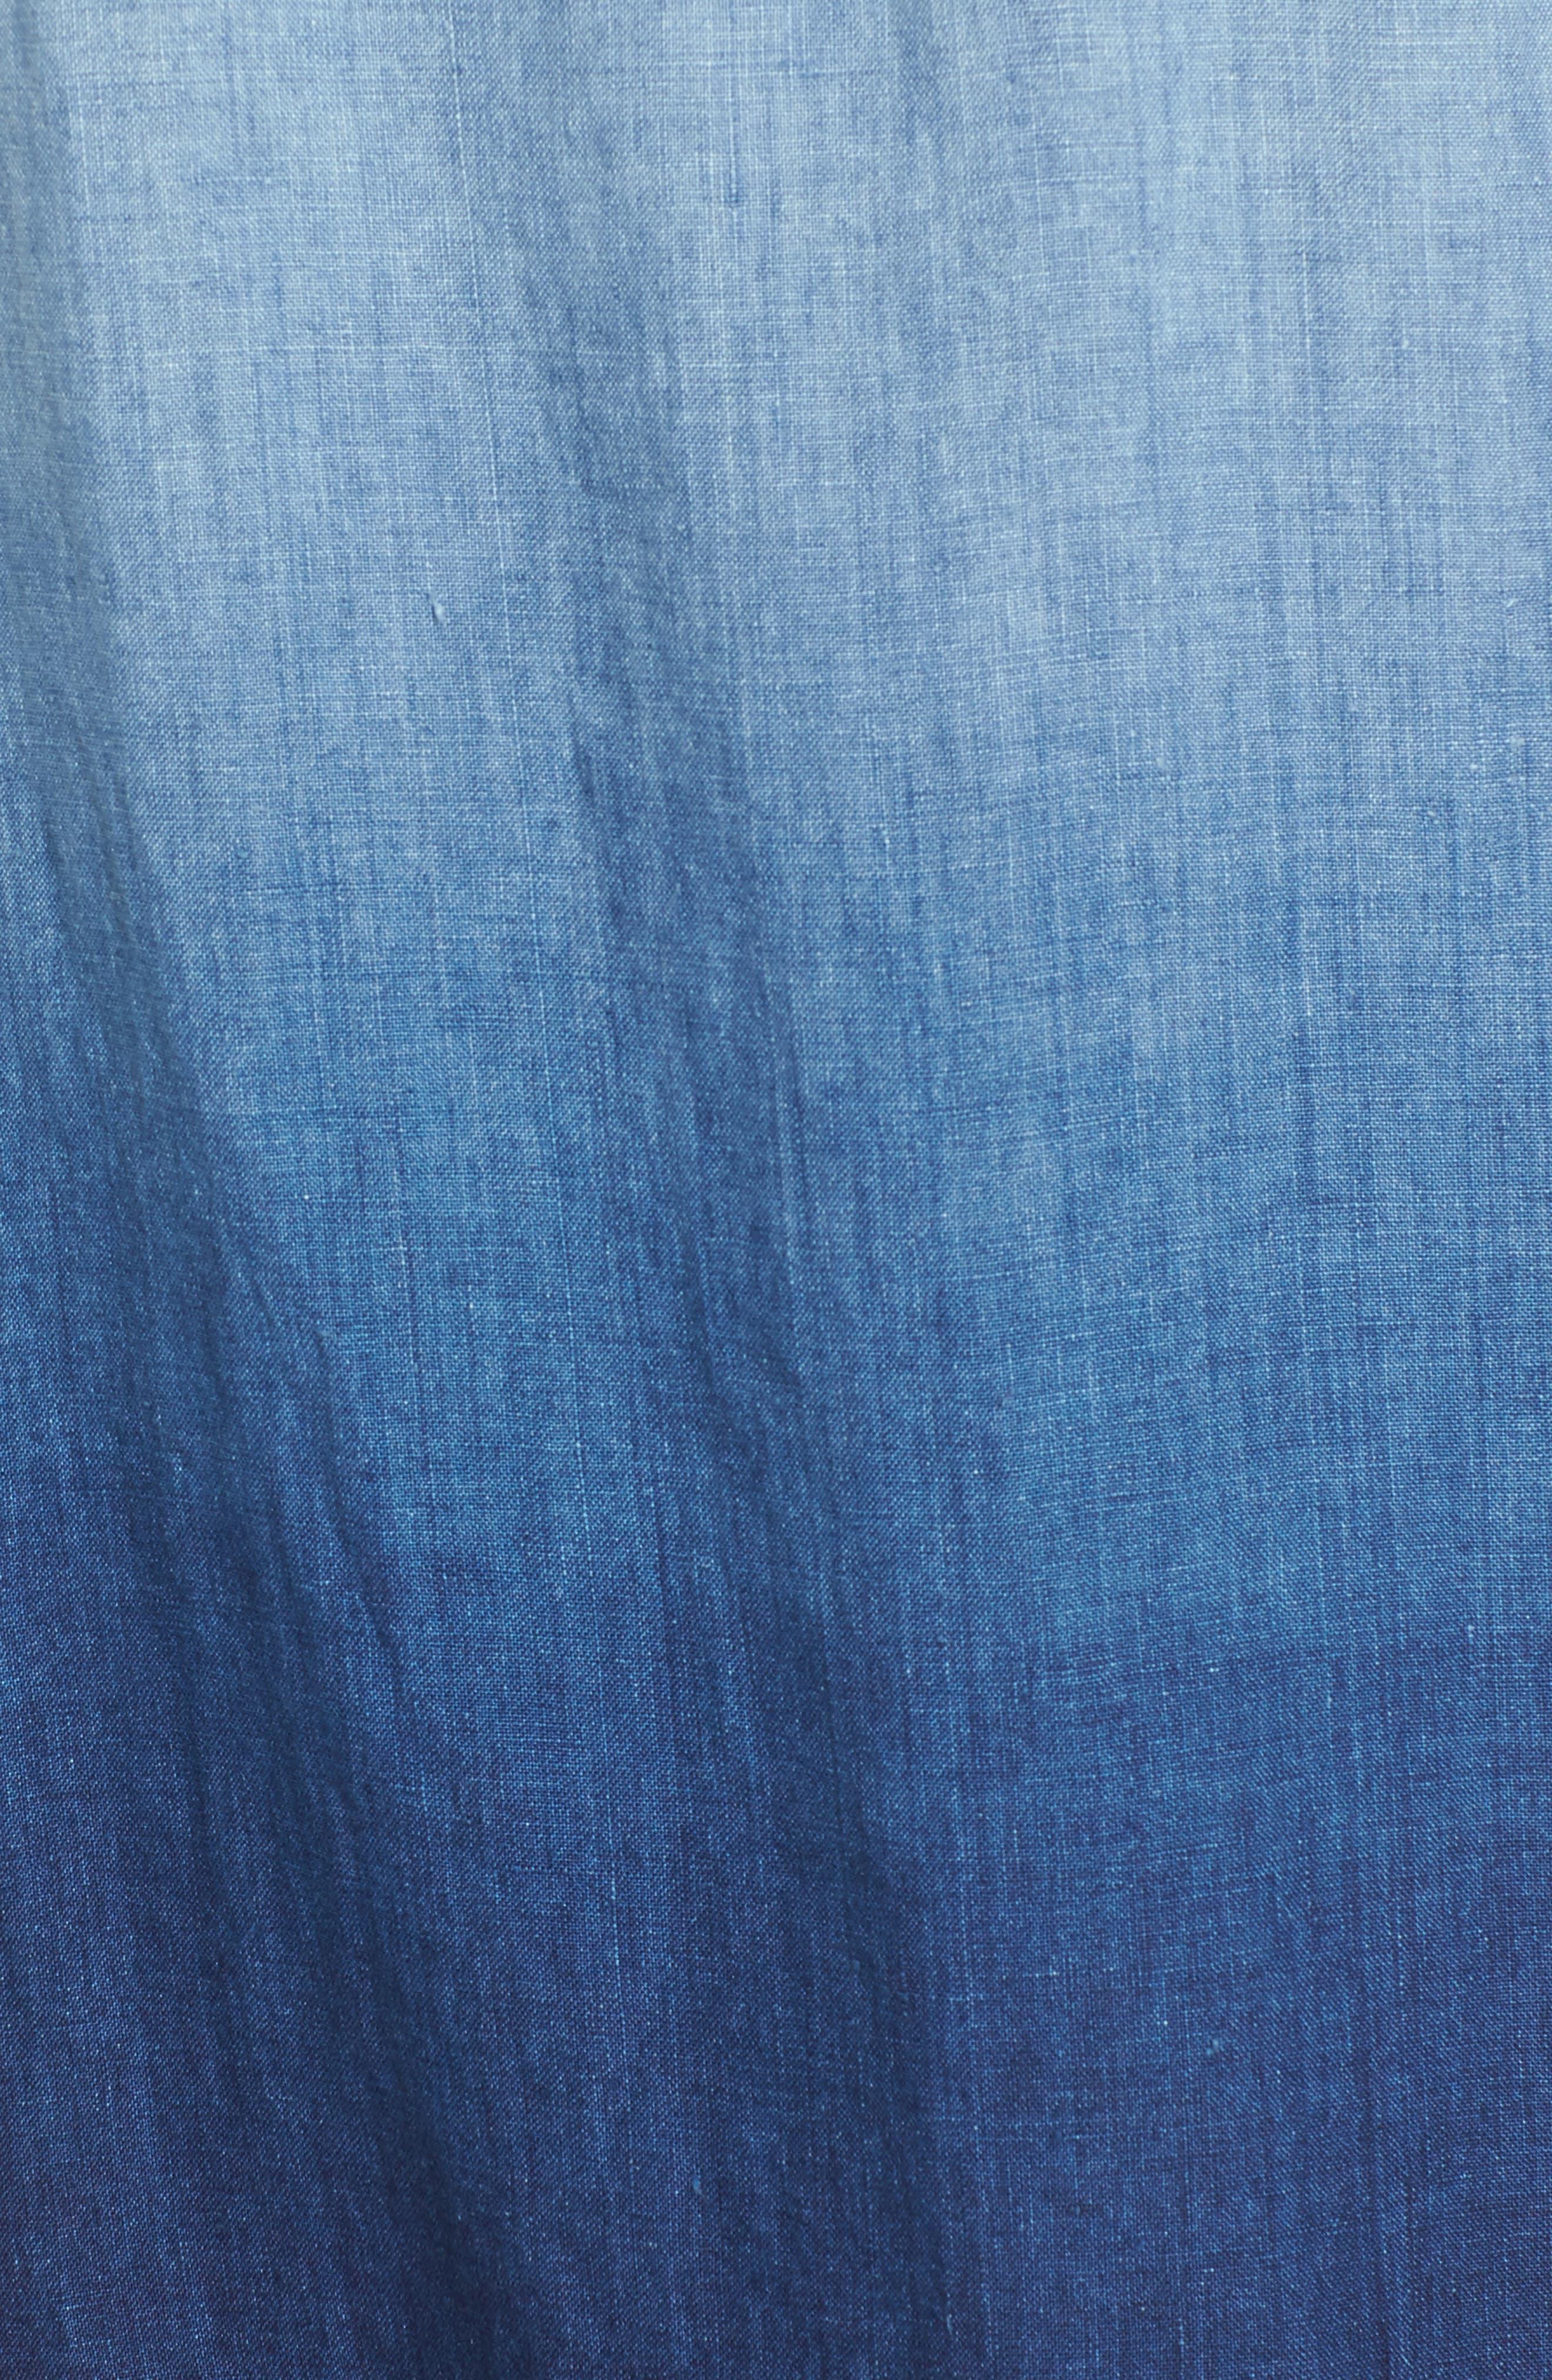 Indigo Dip Dyed Shift Dress,                             Alternate thumbnail 5, color,                             Dark Indigo Wash